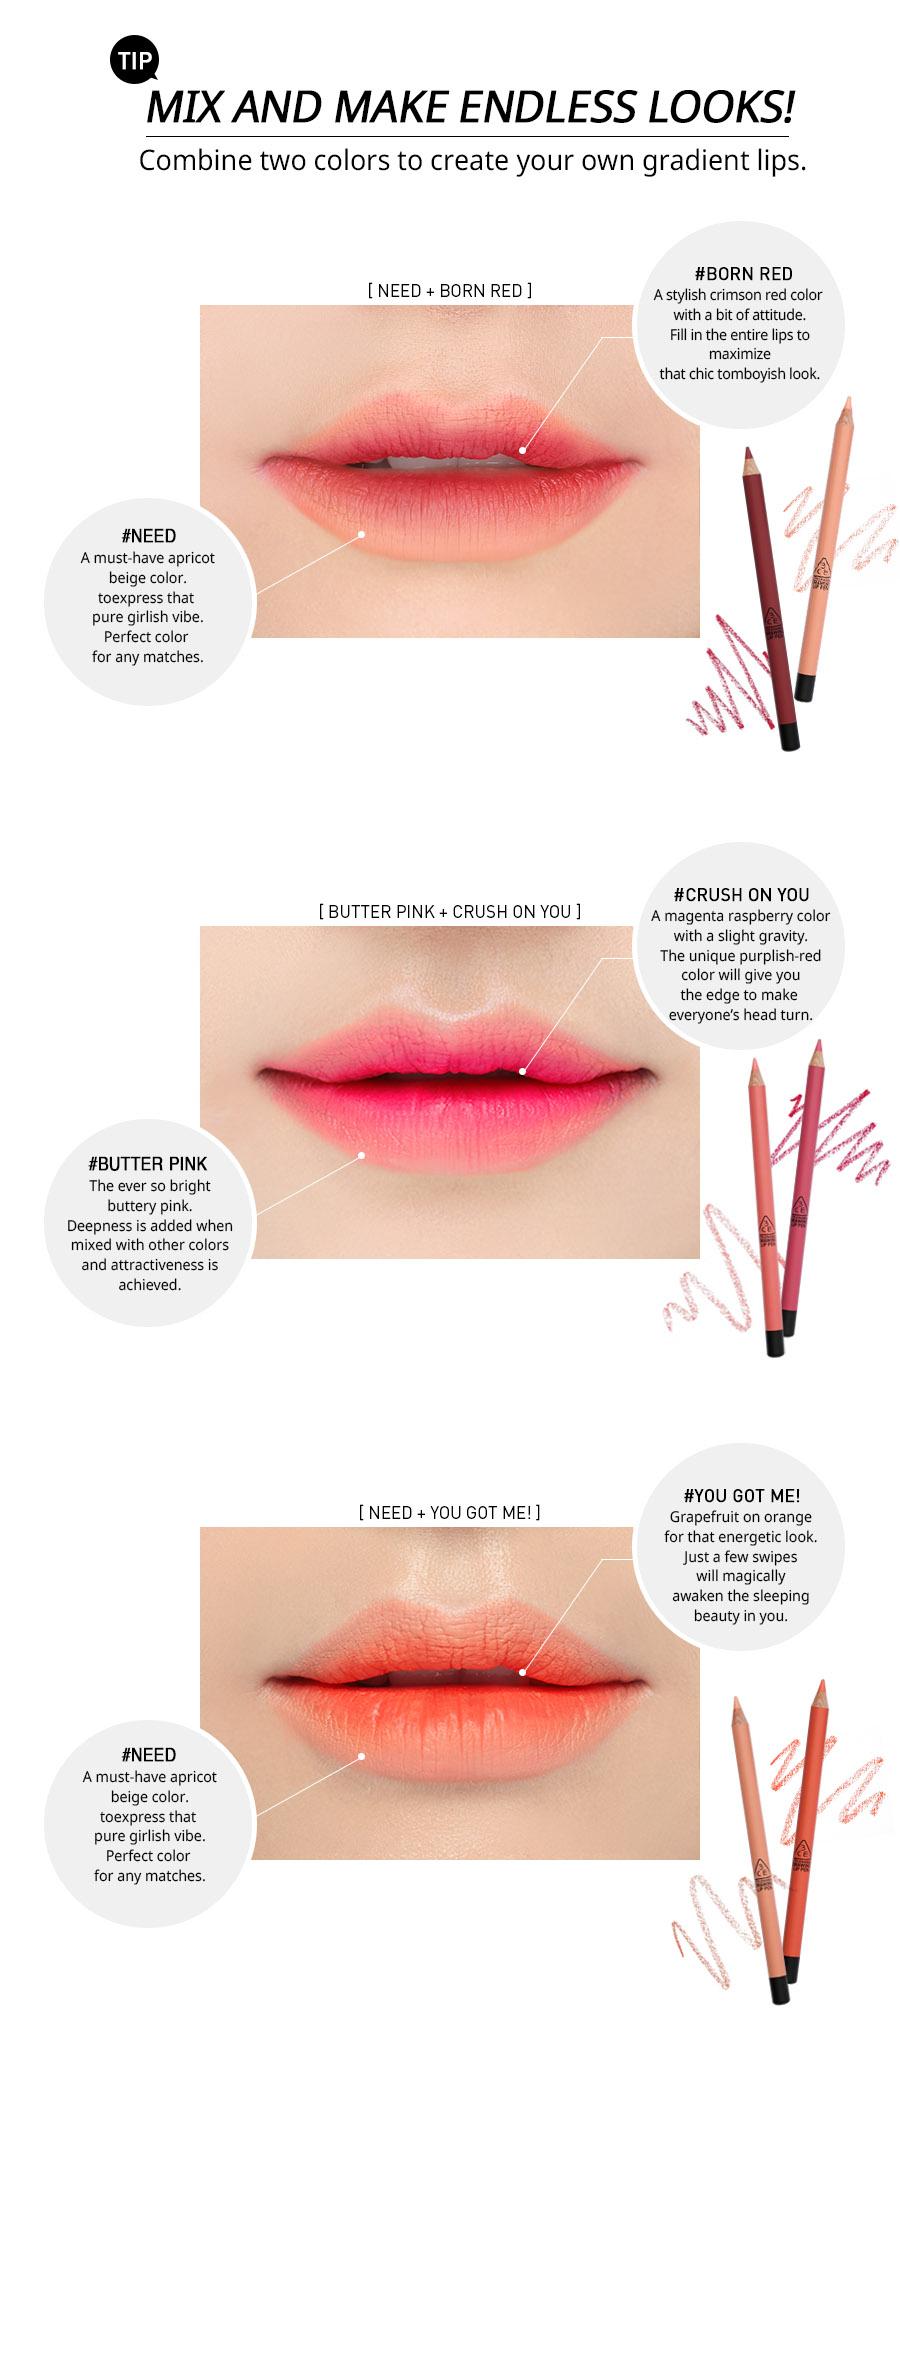 Drawn pen lip STYLENANDA DRAWING 3CE KIT LIP